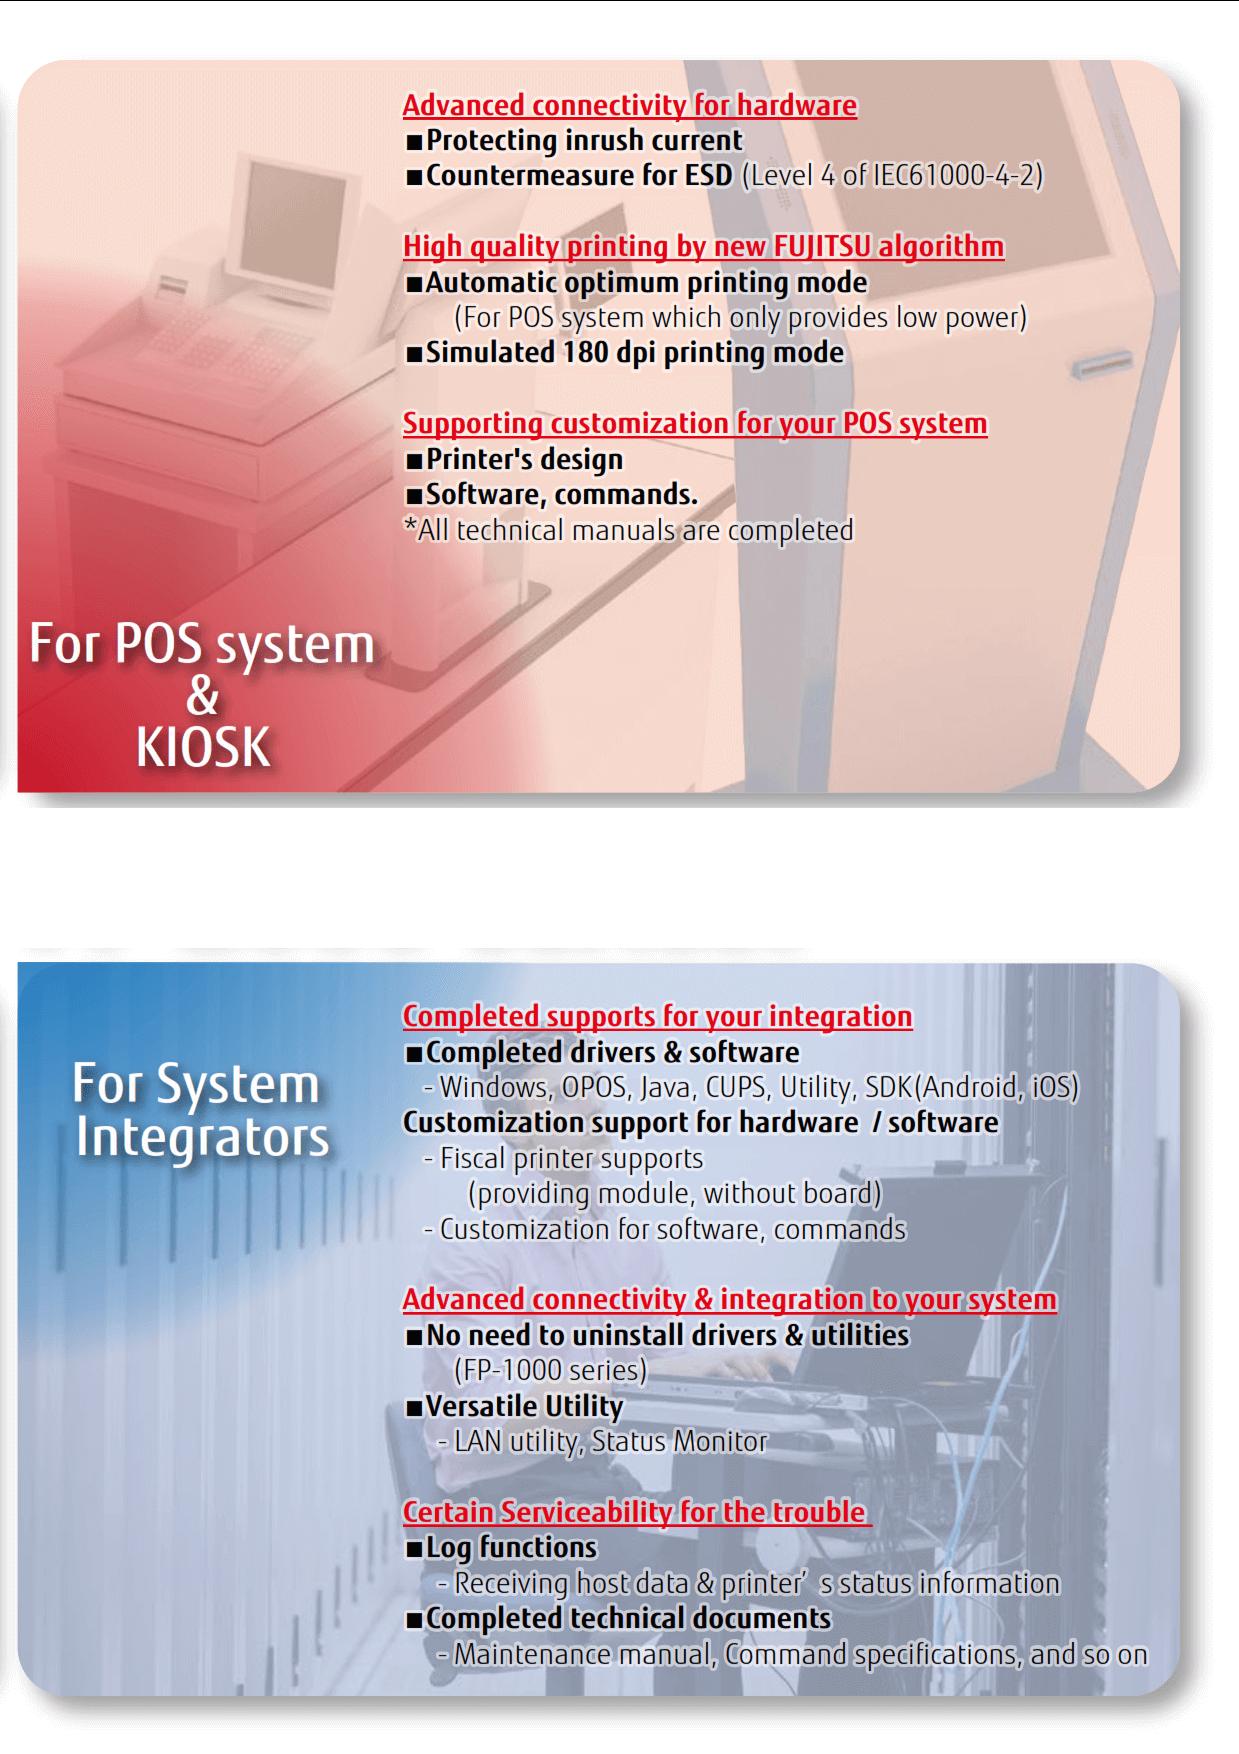 Fujitsu FP-2000 thermal printer series - IQ DistributionsIQ